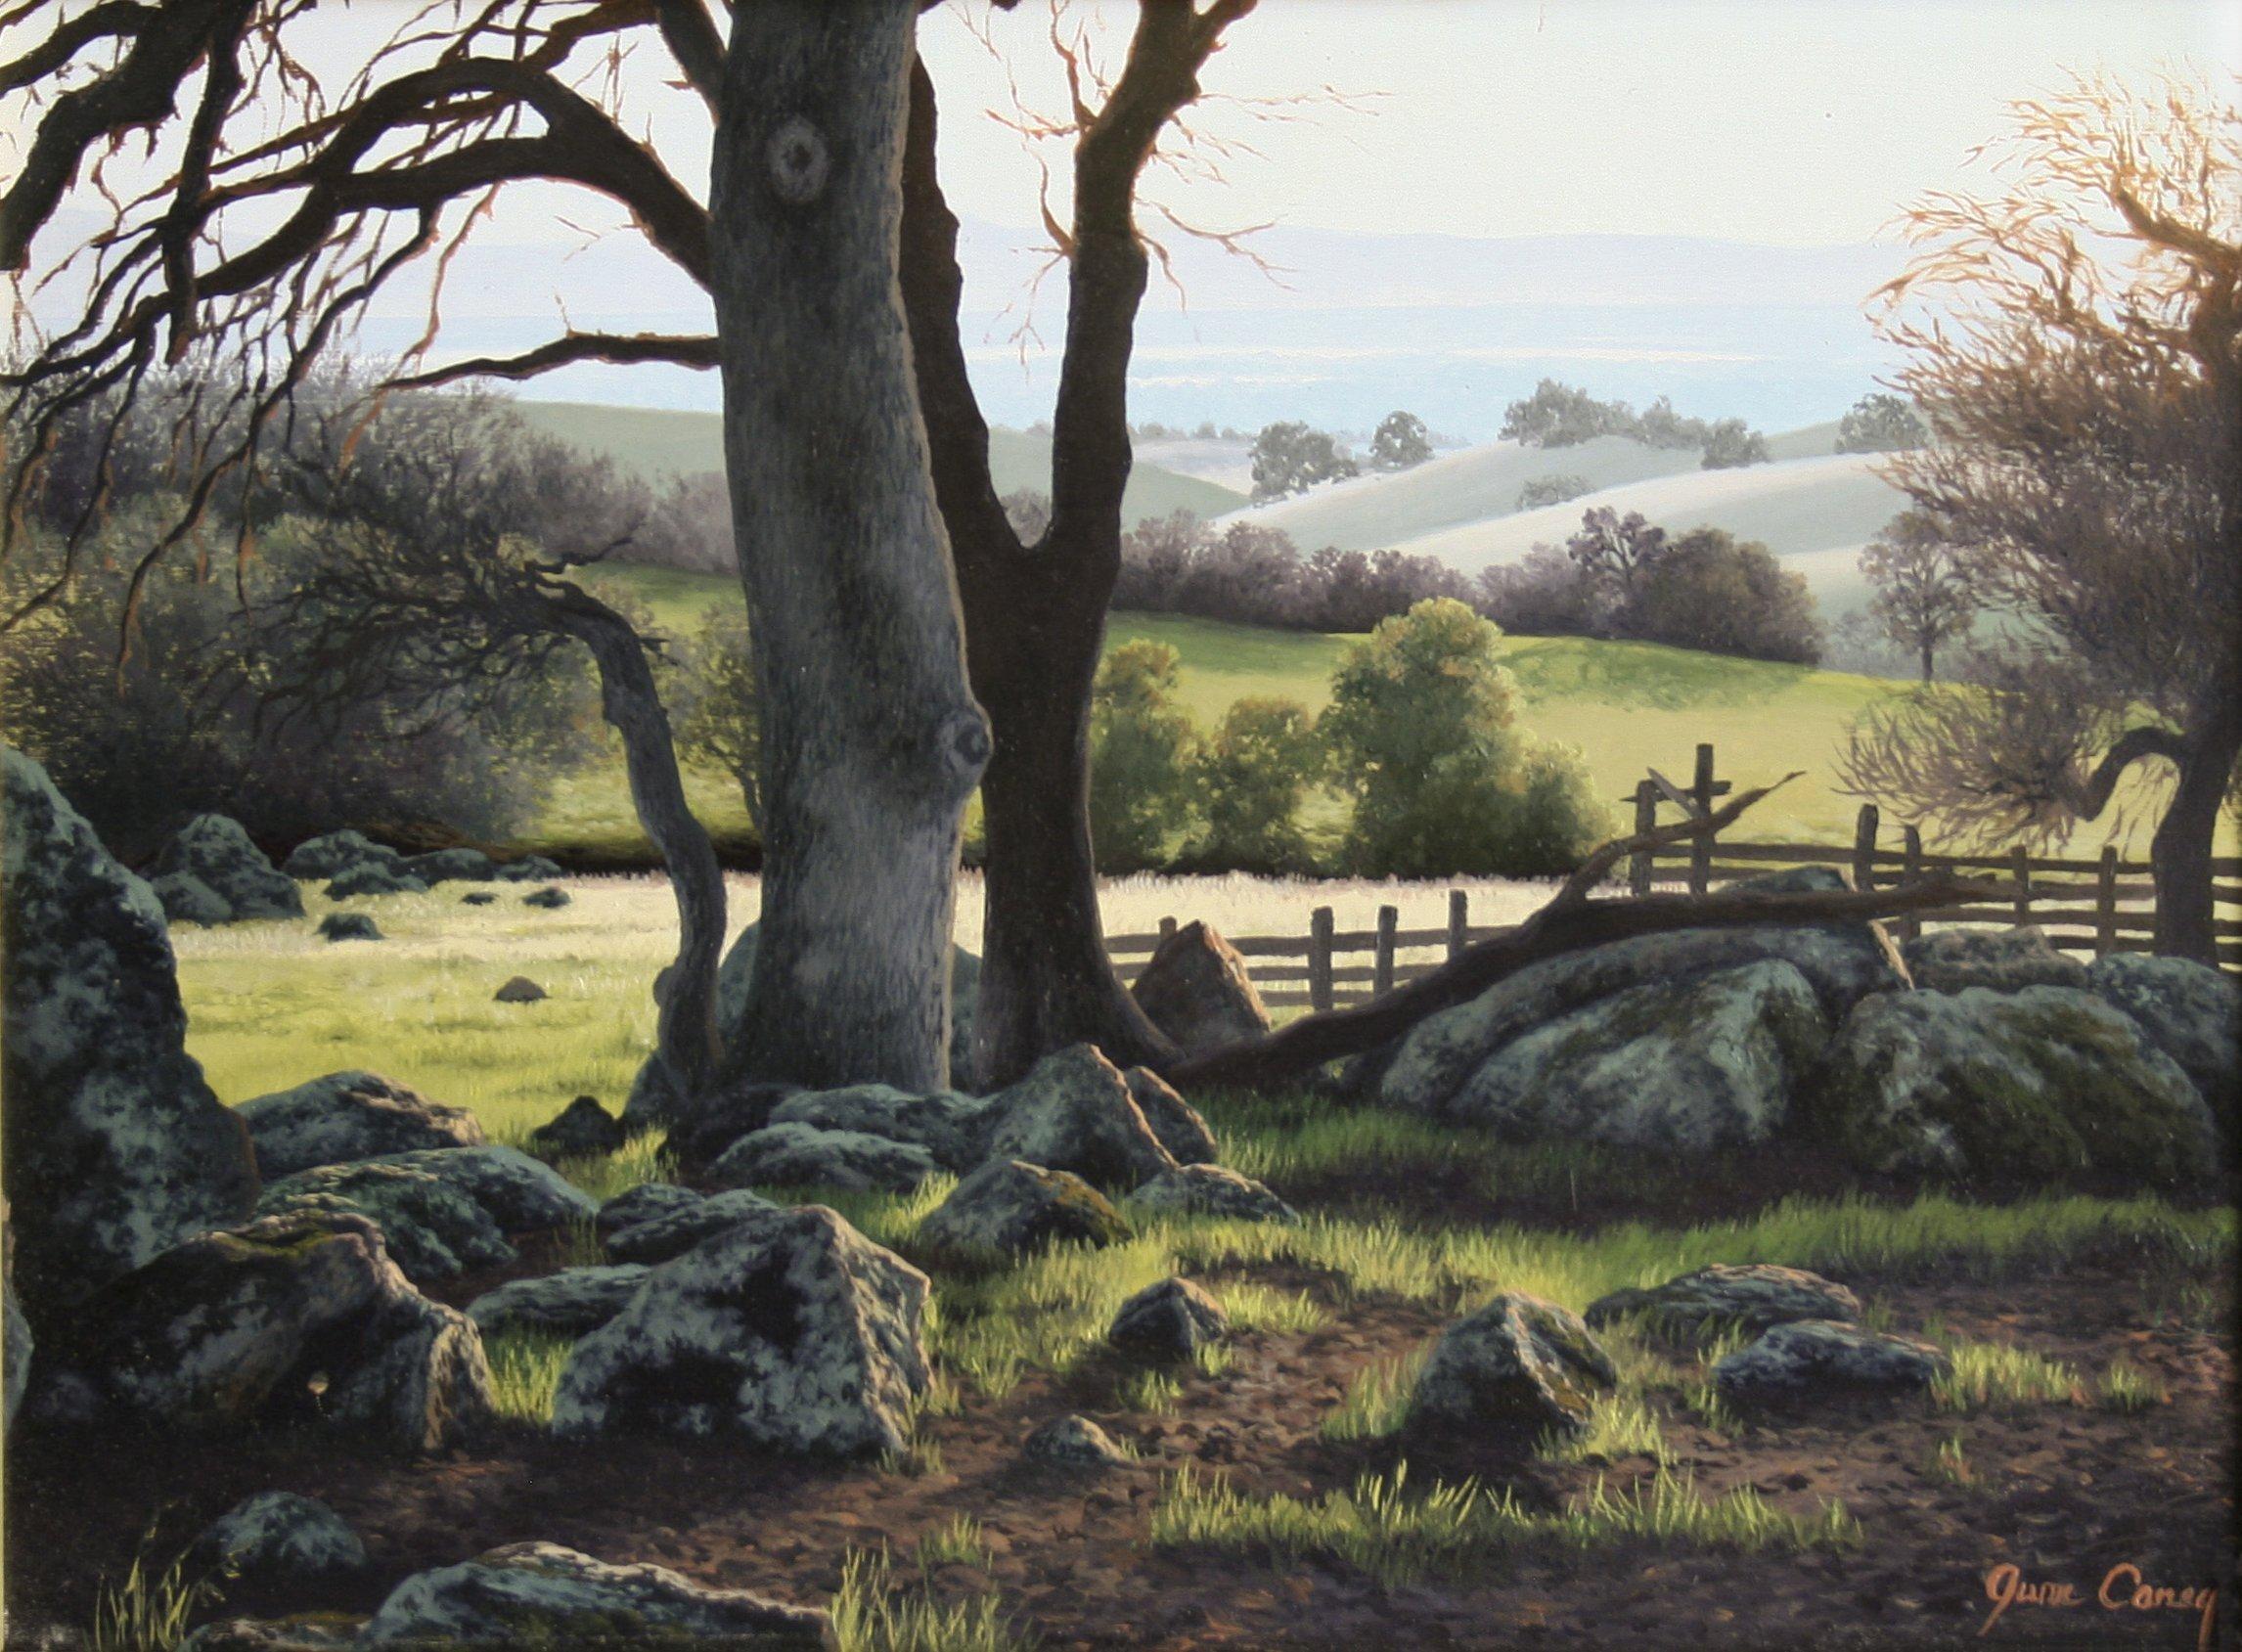 Carey, June – Untitled Landscape With Rocks